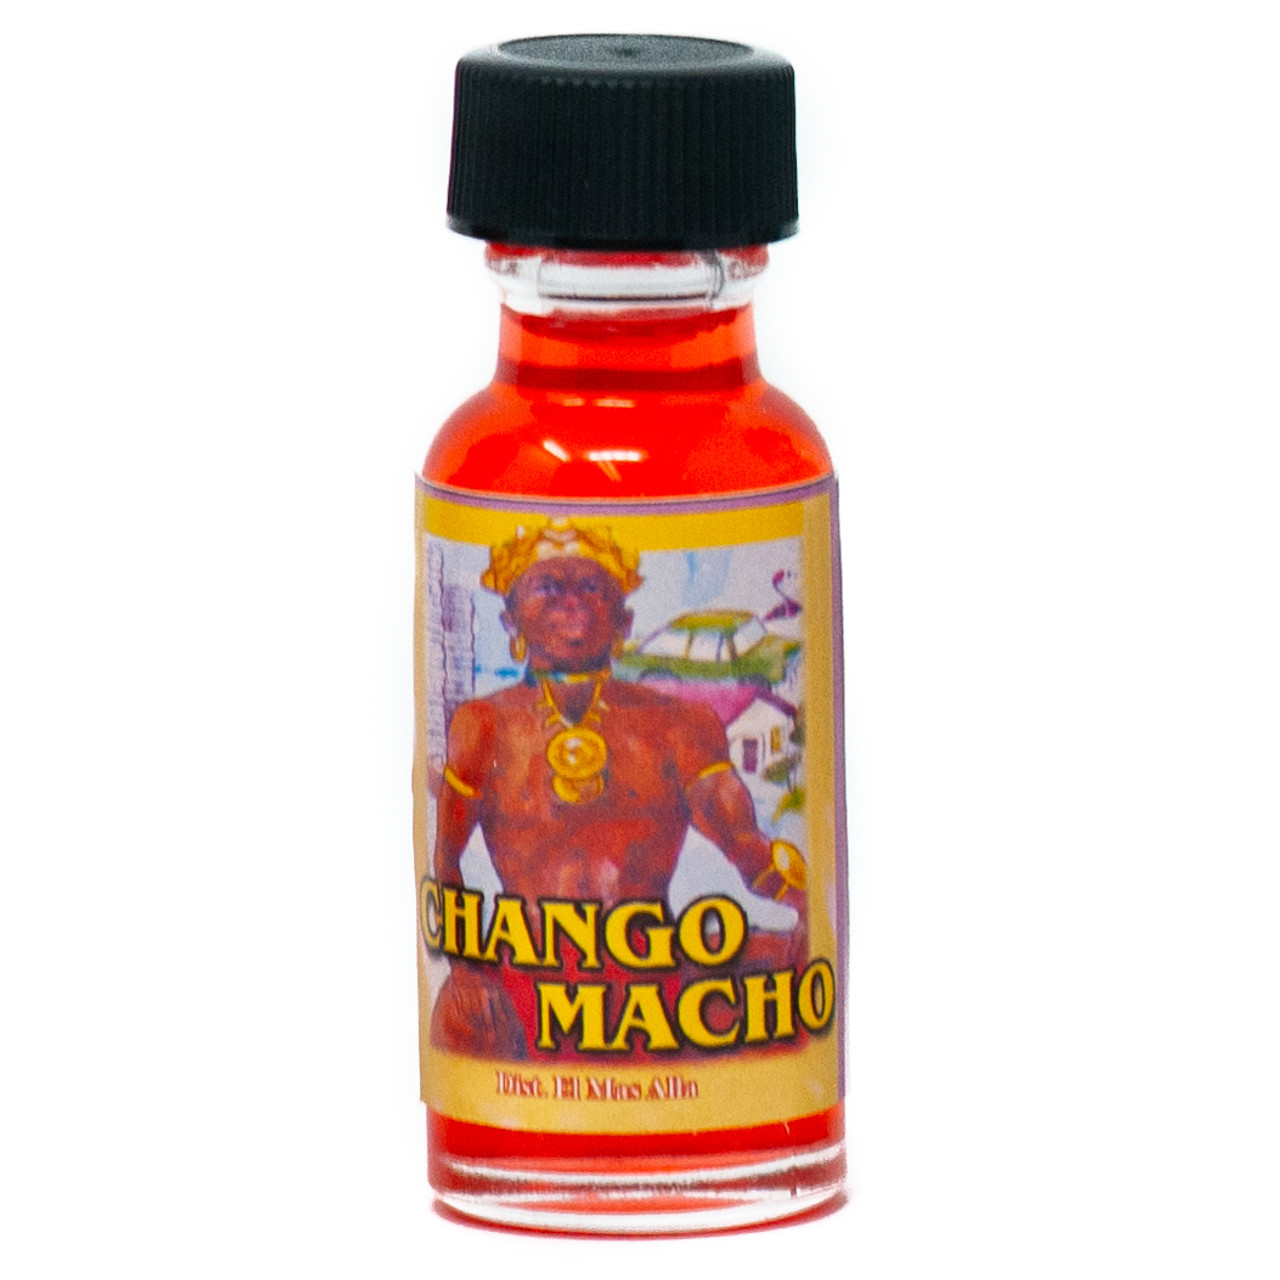 Aceite Chango Macho